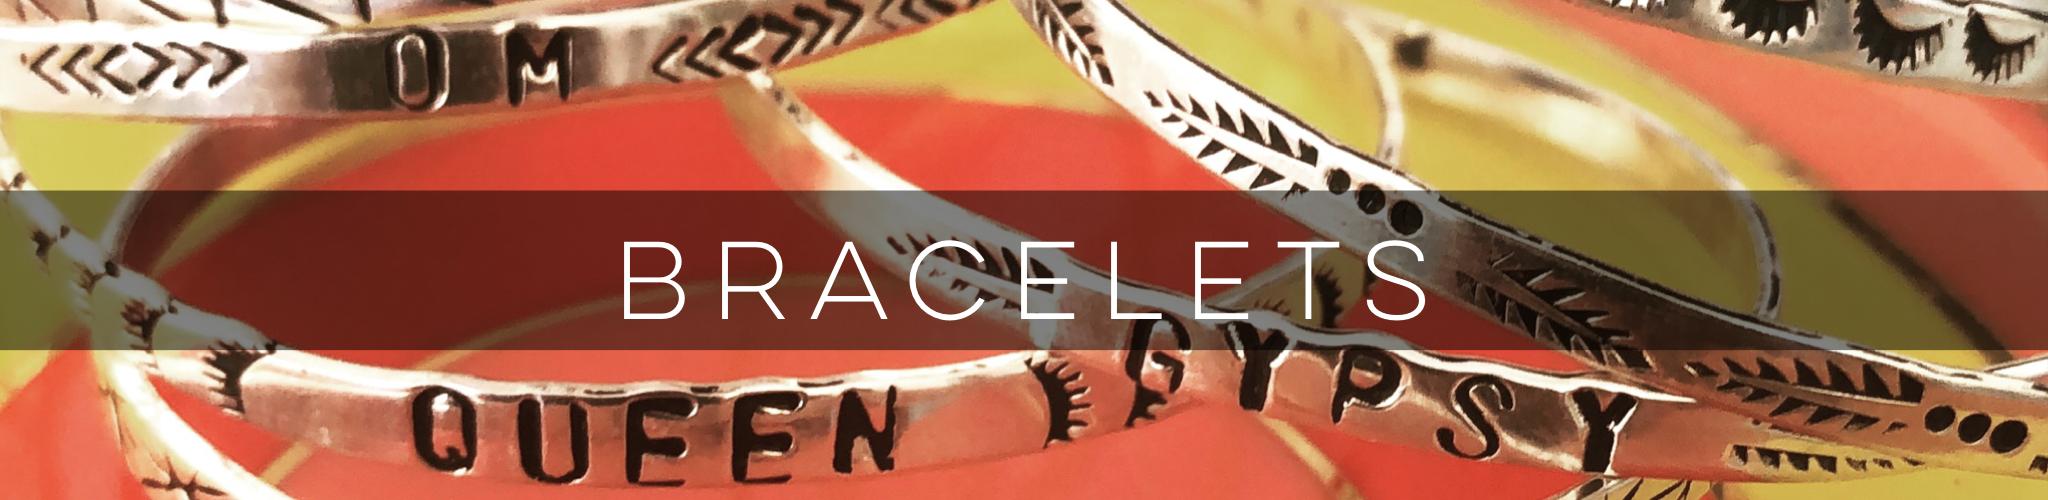 Jewel of the Gypsy Bracelets